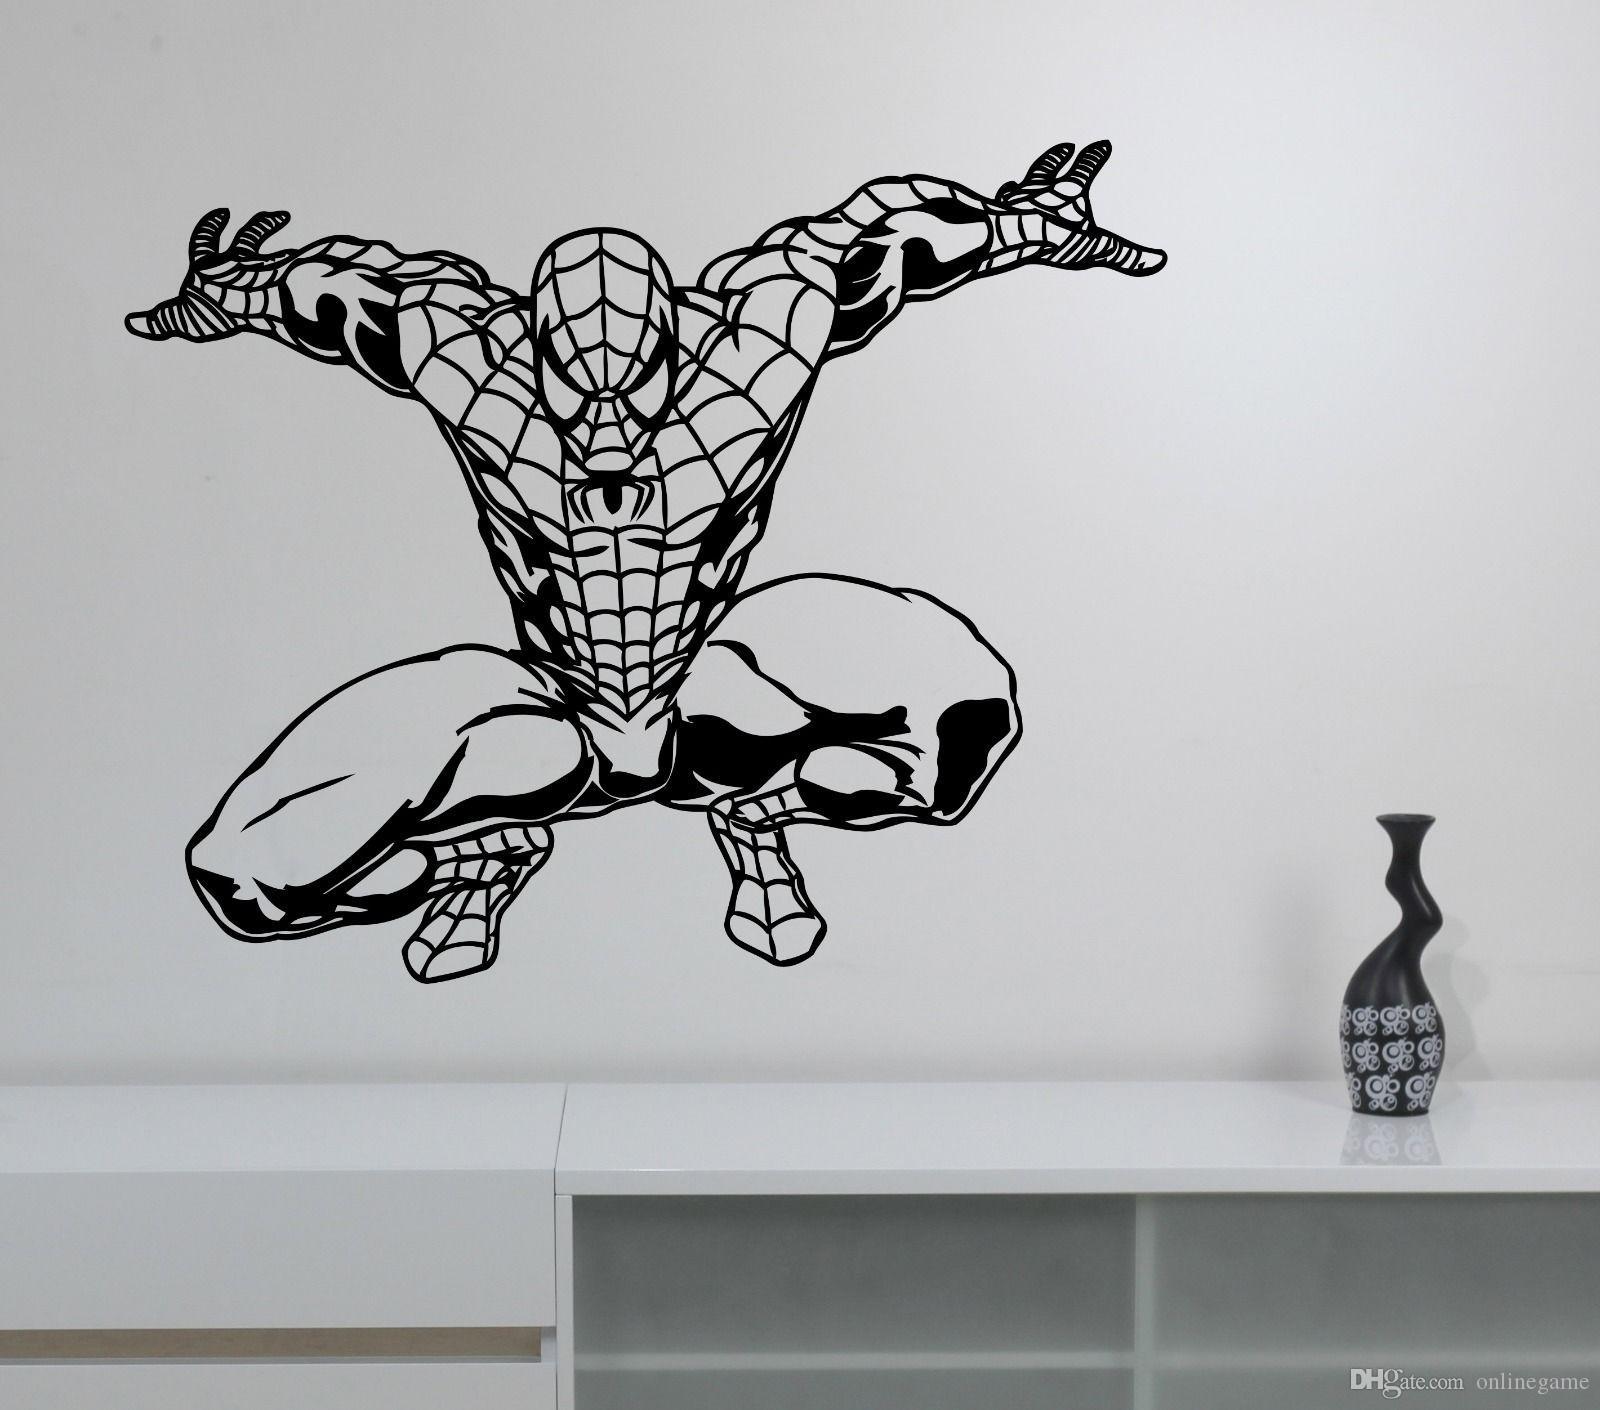 Spiderman Wall Sticker Comics Superhero Vinyl Decal Art ...